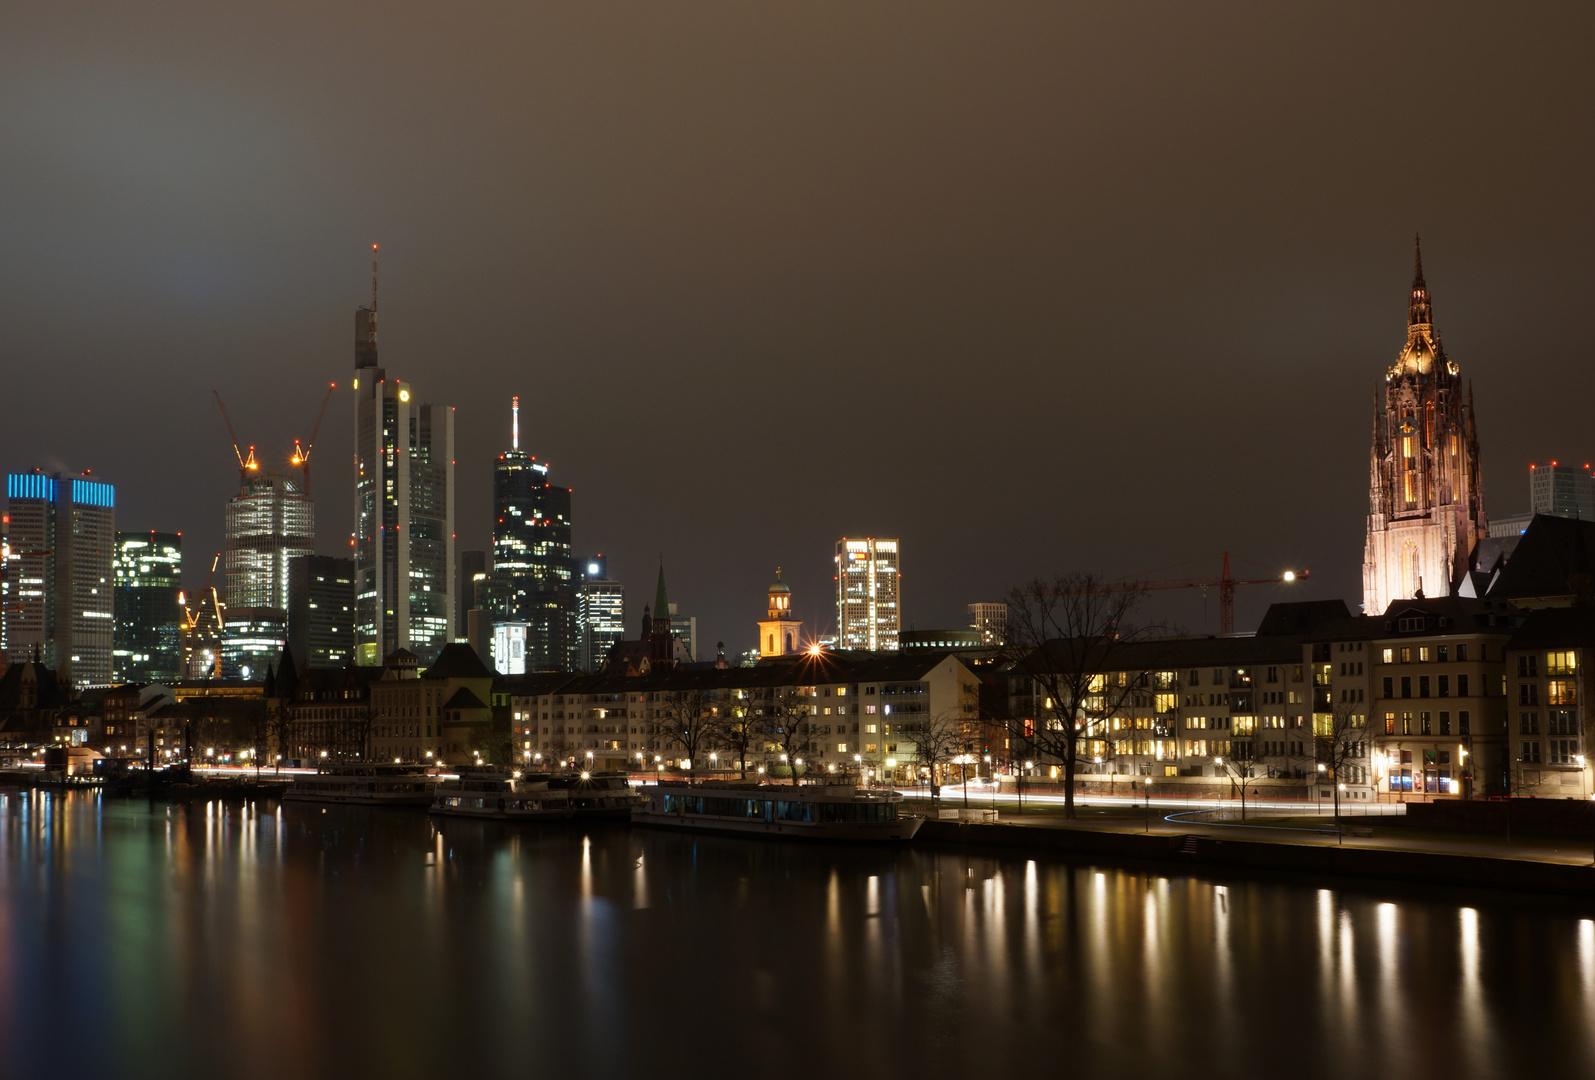 Fotopraxis - Frankfurt a. M. bei Nacht 2